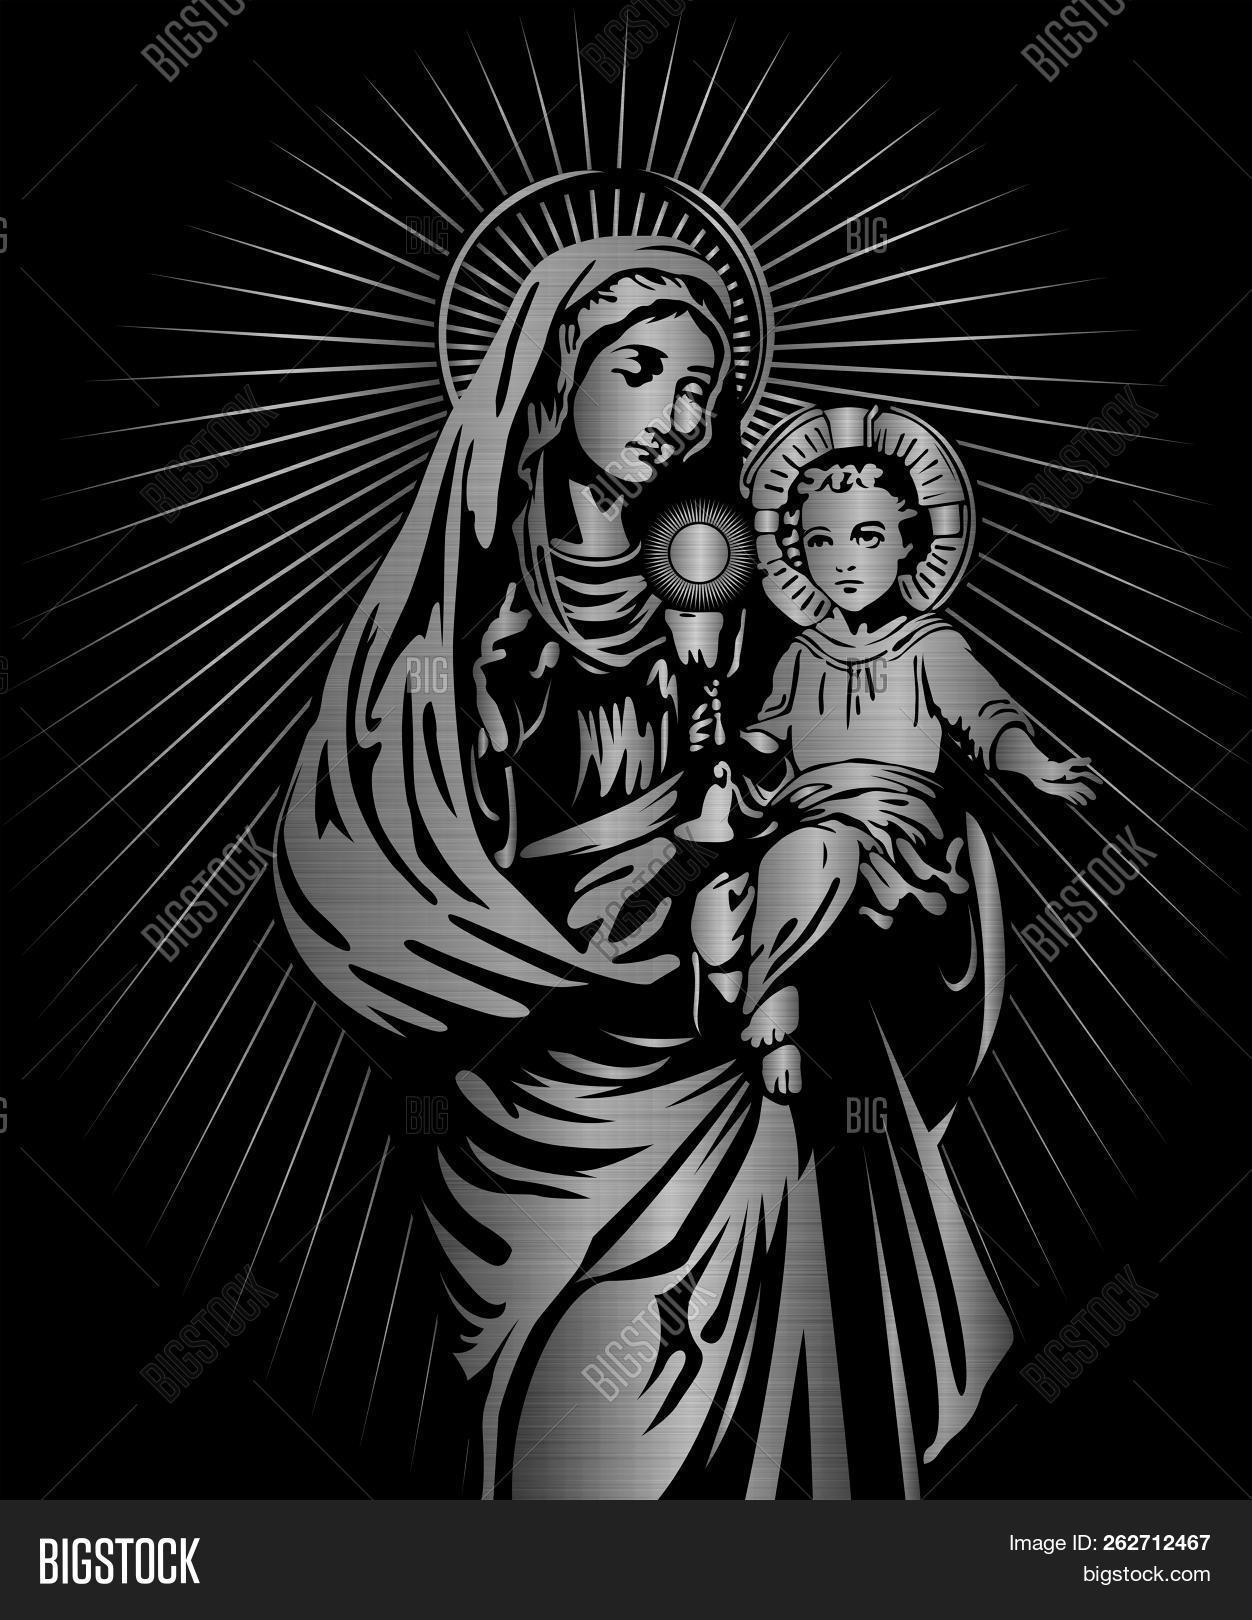 angel,baby,bible,catholicism,celebration,child,christ,christianity,christmas,church,concept,faith,god,holiday,holy,hope,illustration,jesus,love,mary,metallic,mother,nativity,prayer,religion,saint,virgin,woman,xmas